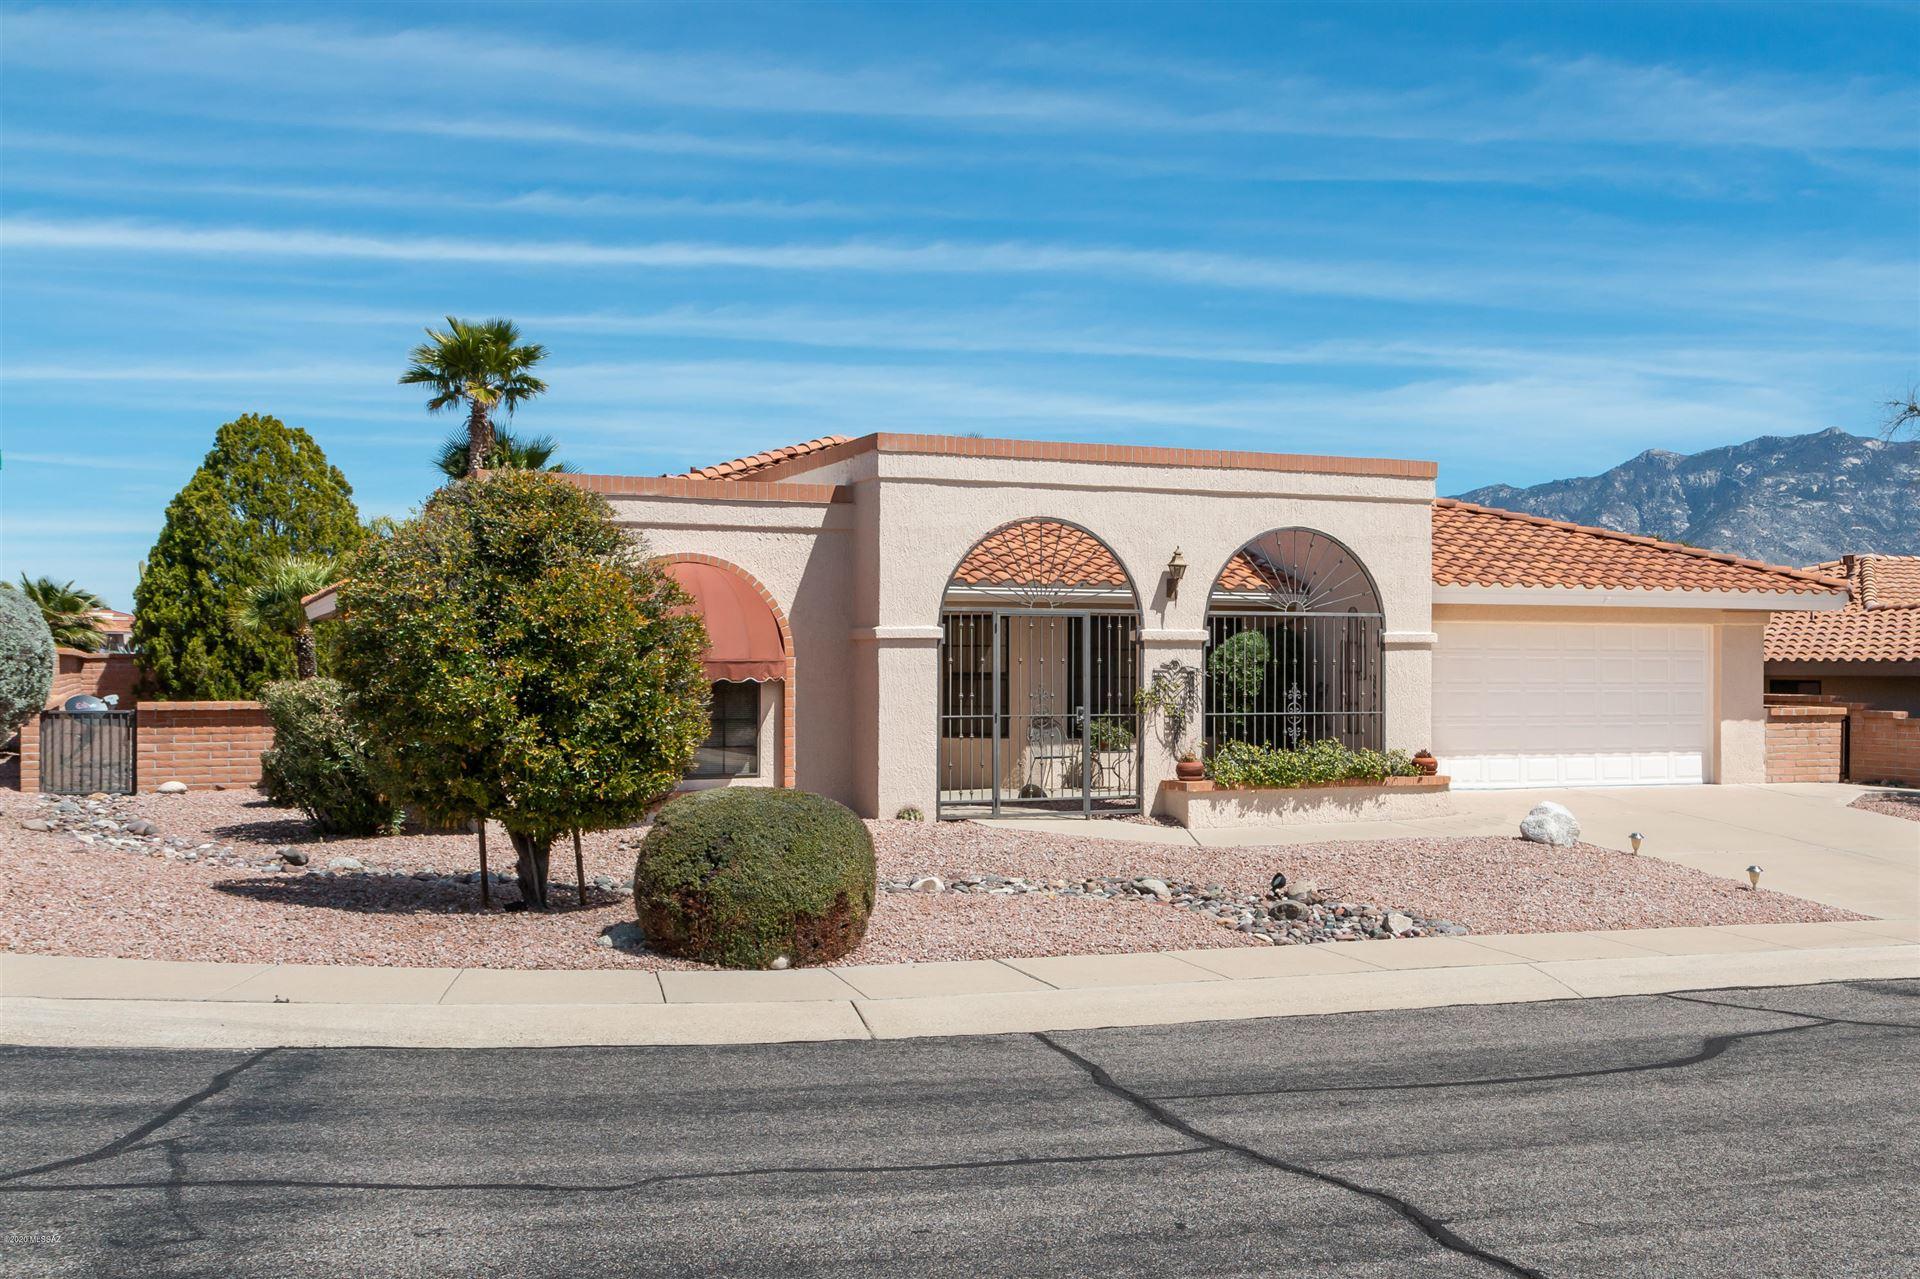 14550 N Crown Point Drive, Oro Valley, AZ 85755 - #: 22031197